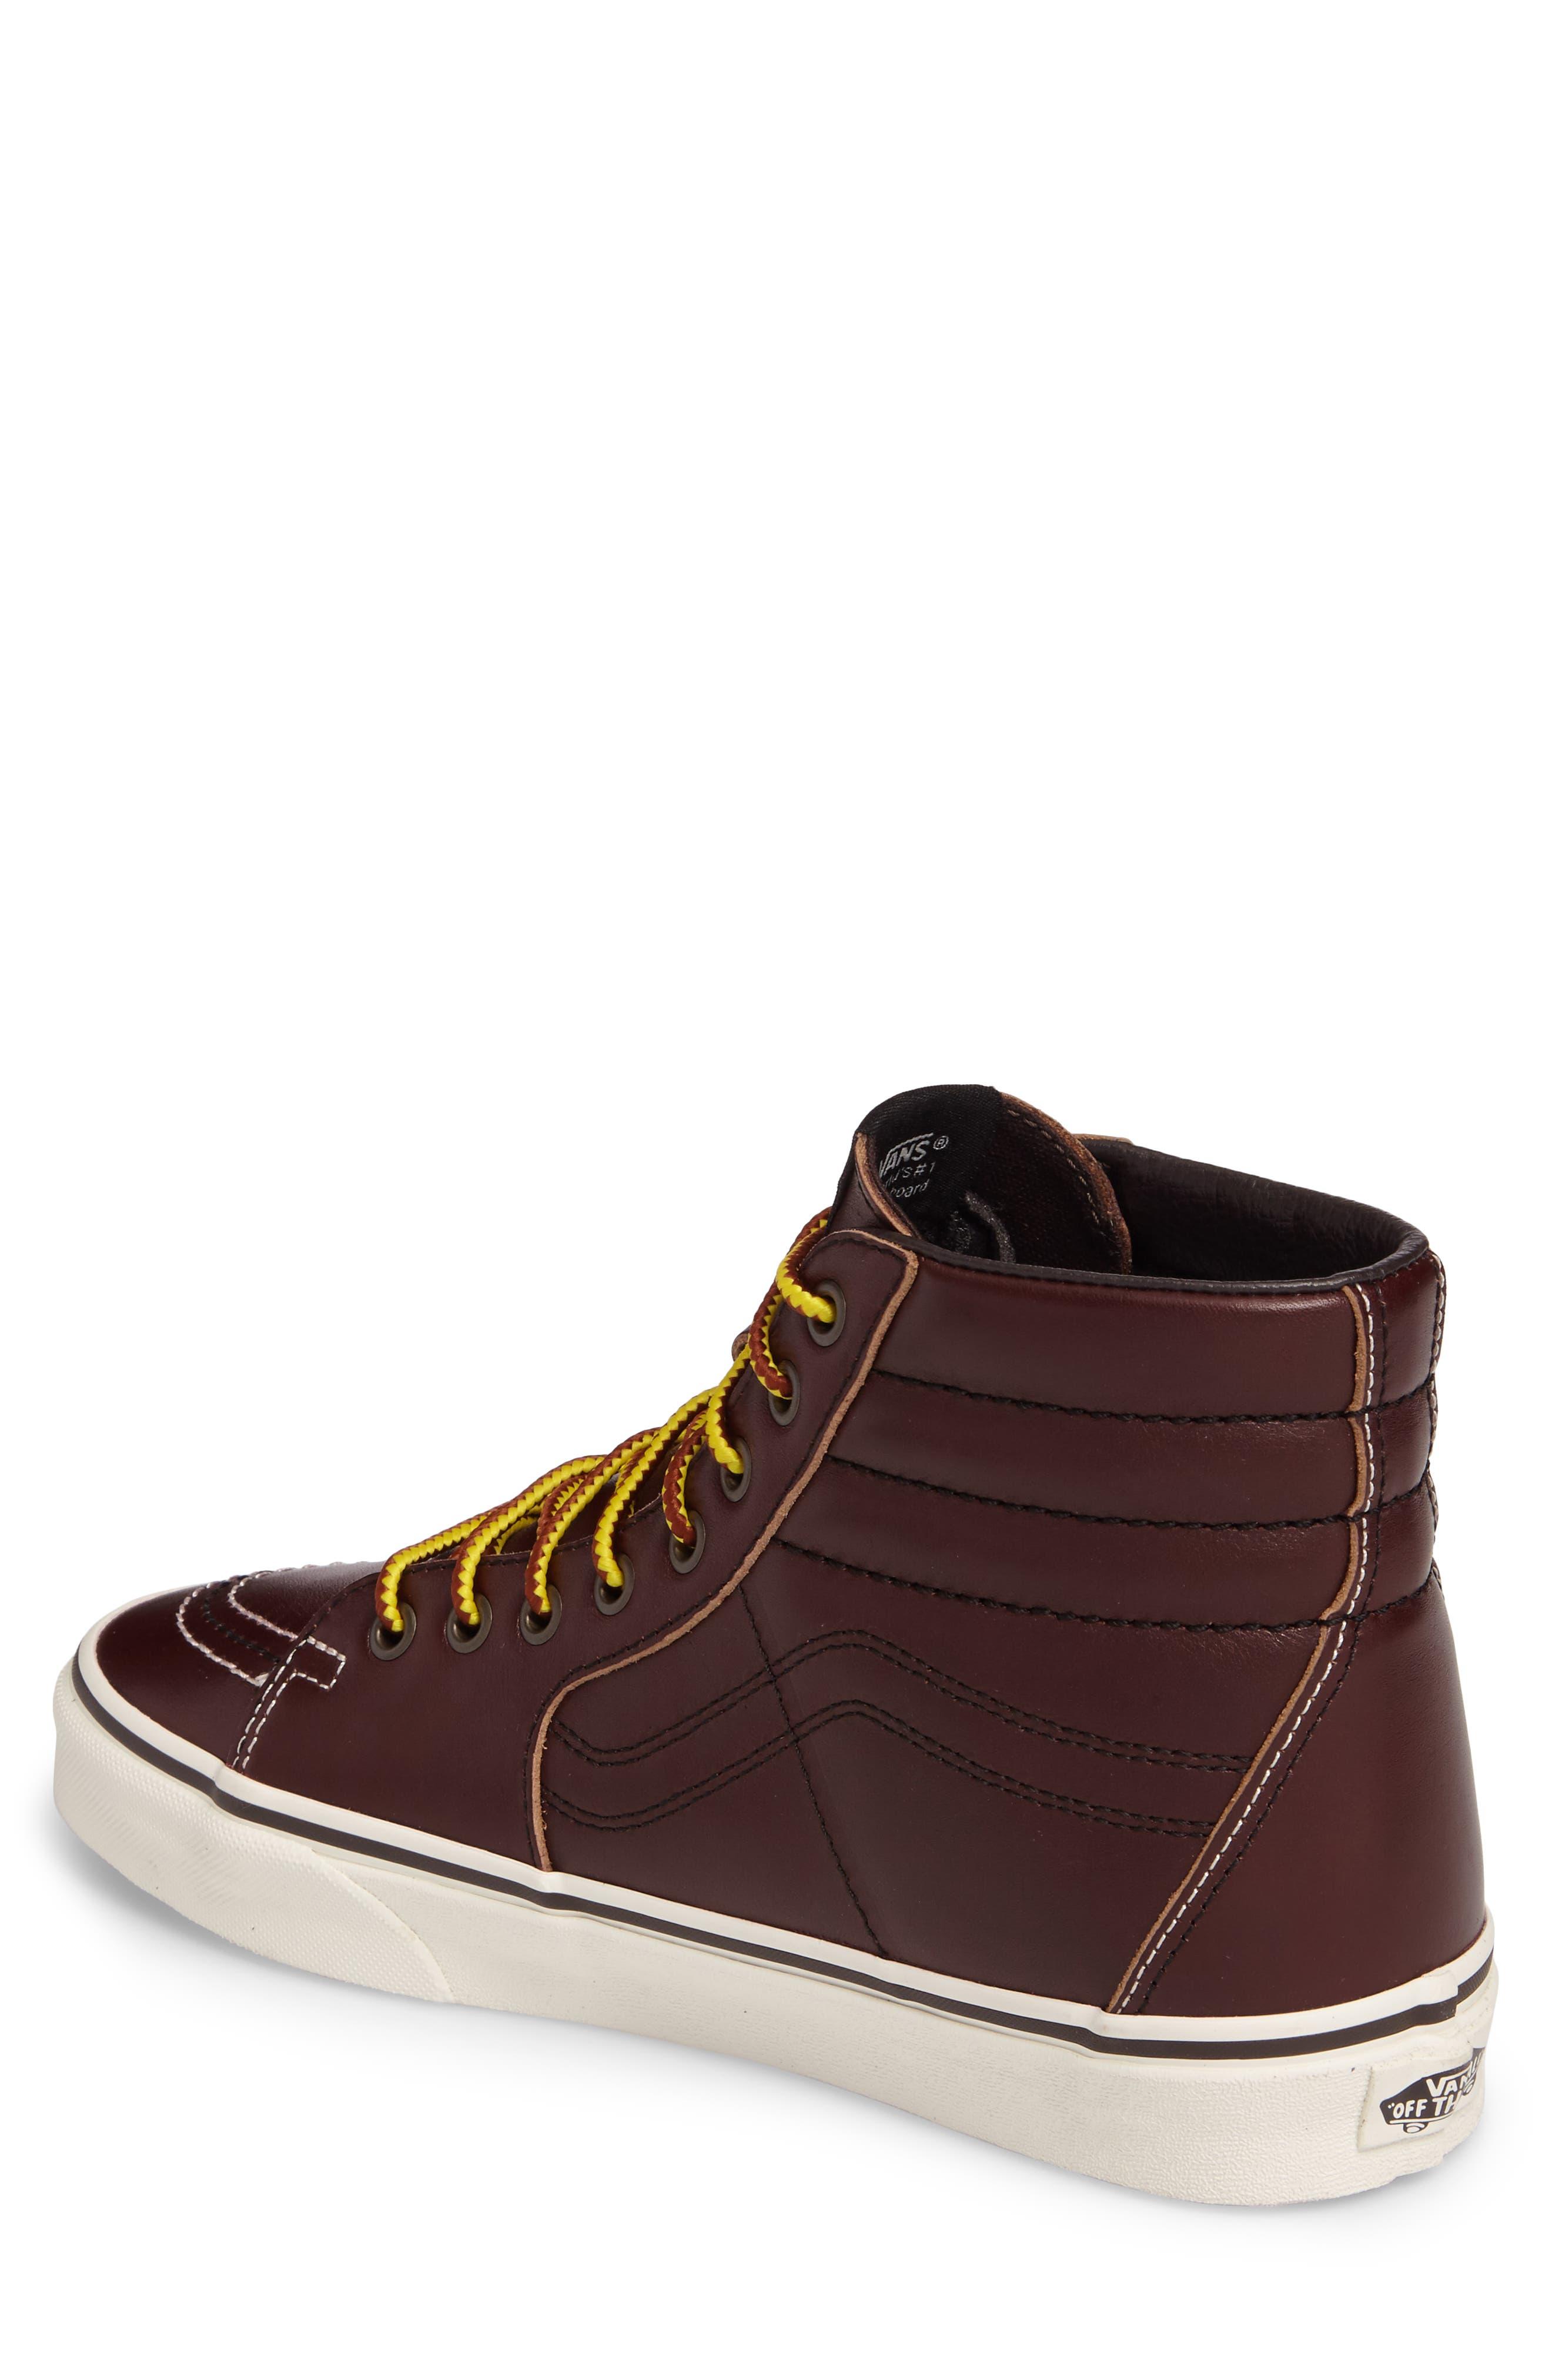 Sk8-Hi Sneaker,                             Alternate thumbnail 2, color,                             Rum Raisin/Marshmallow Leather